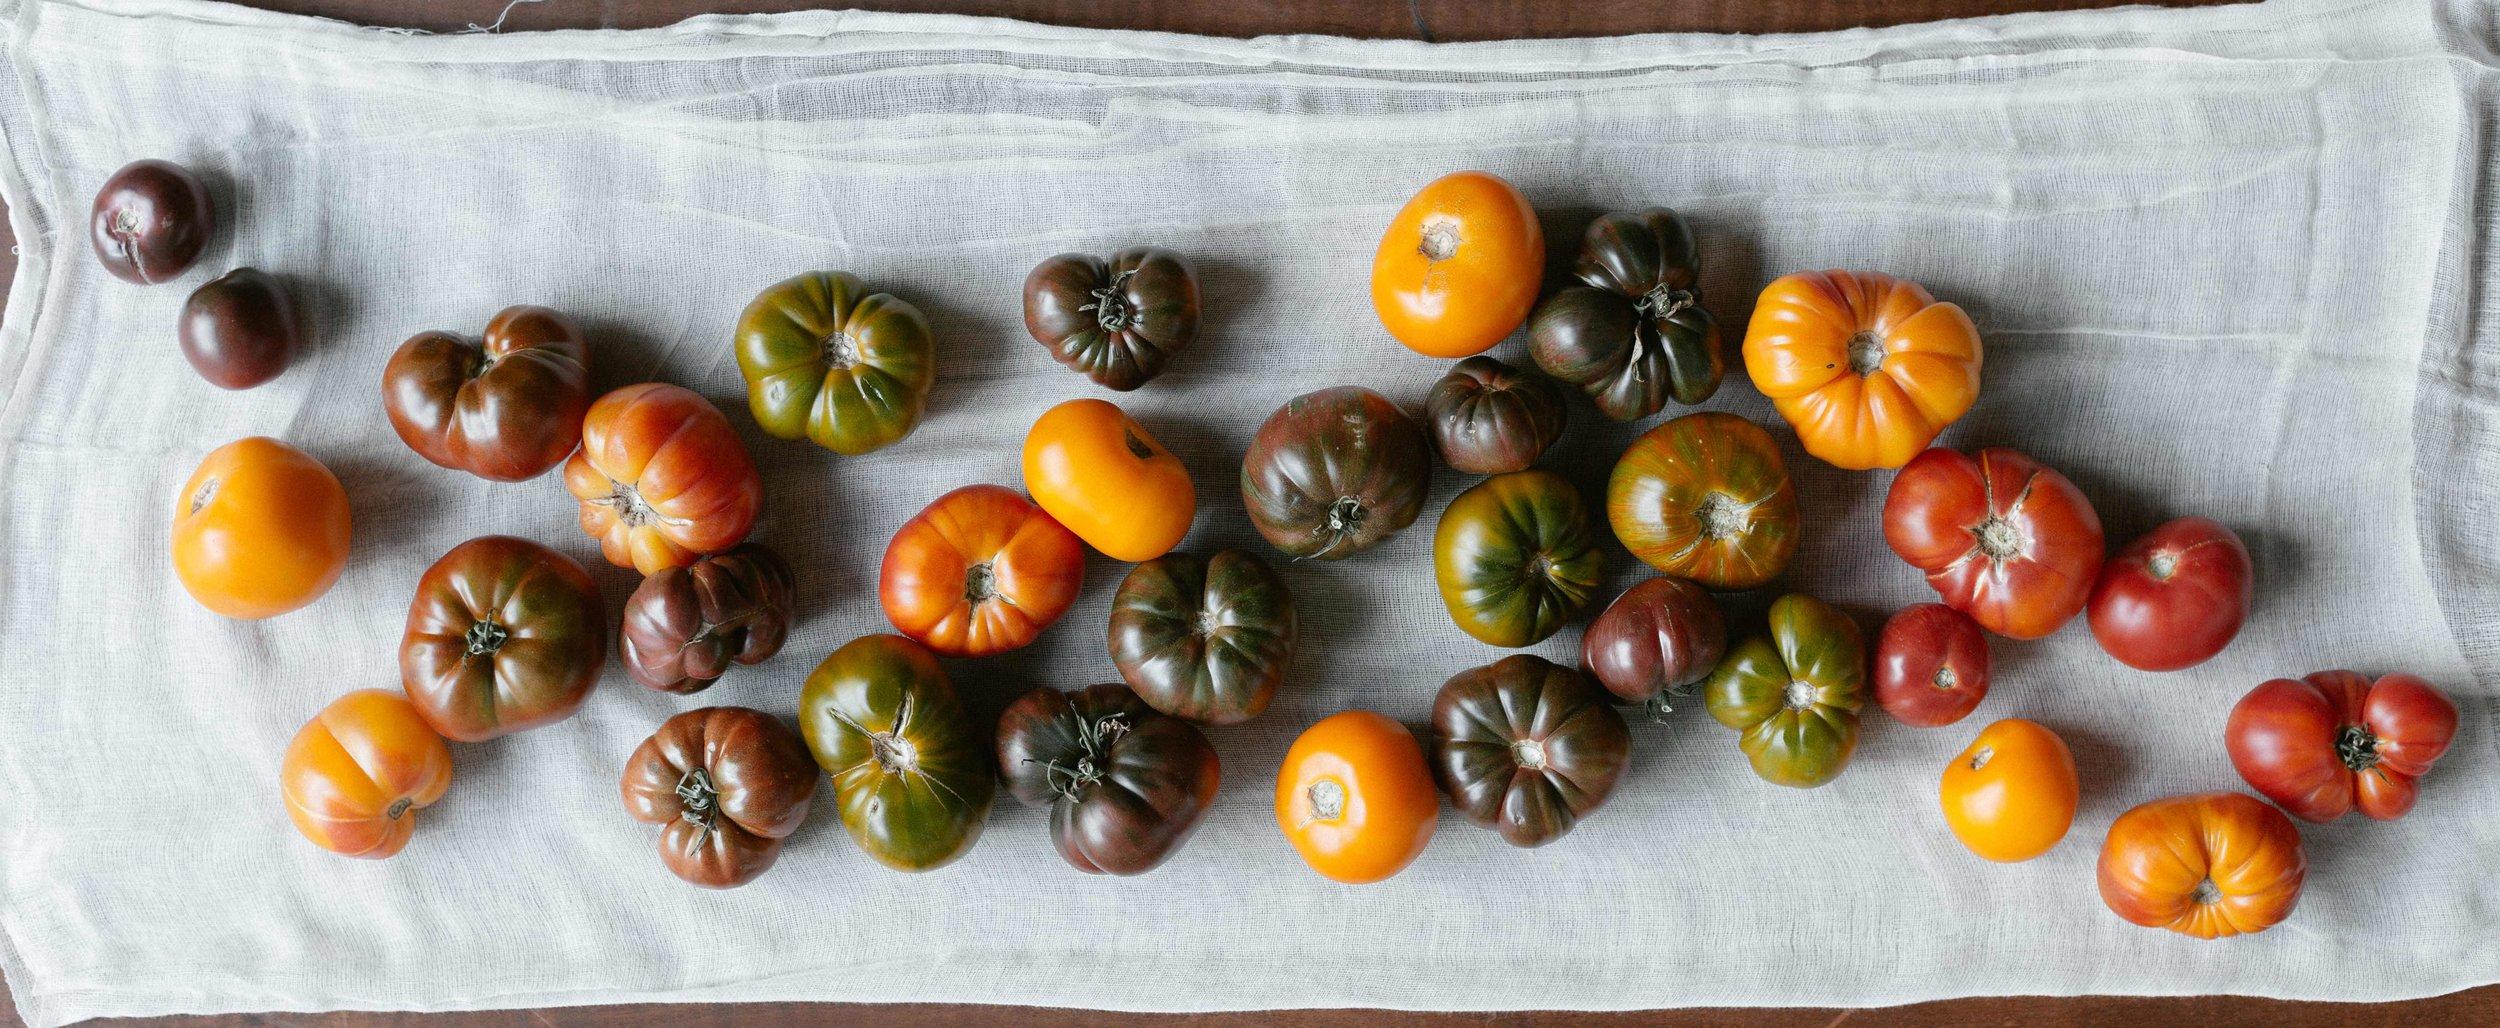 local-heirloom-tomatoes-riverwards-produce.jpg